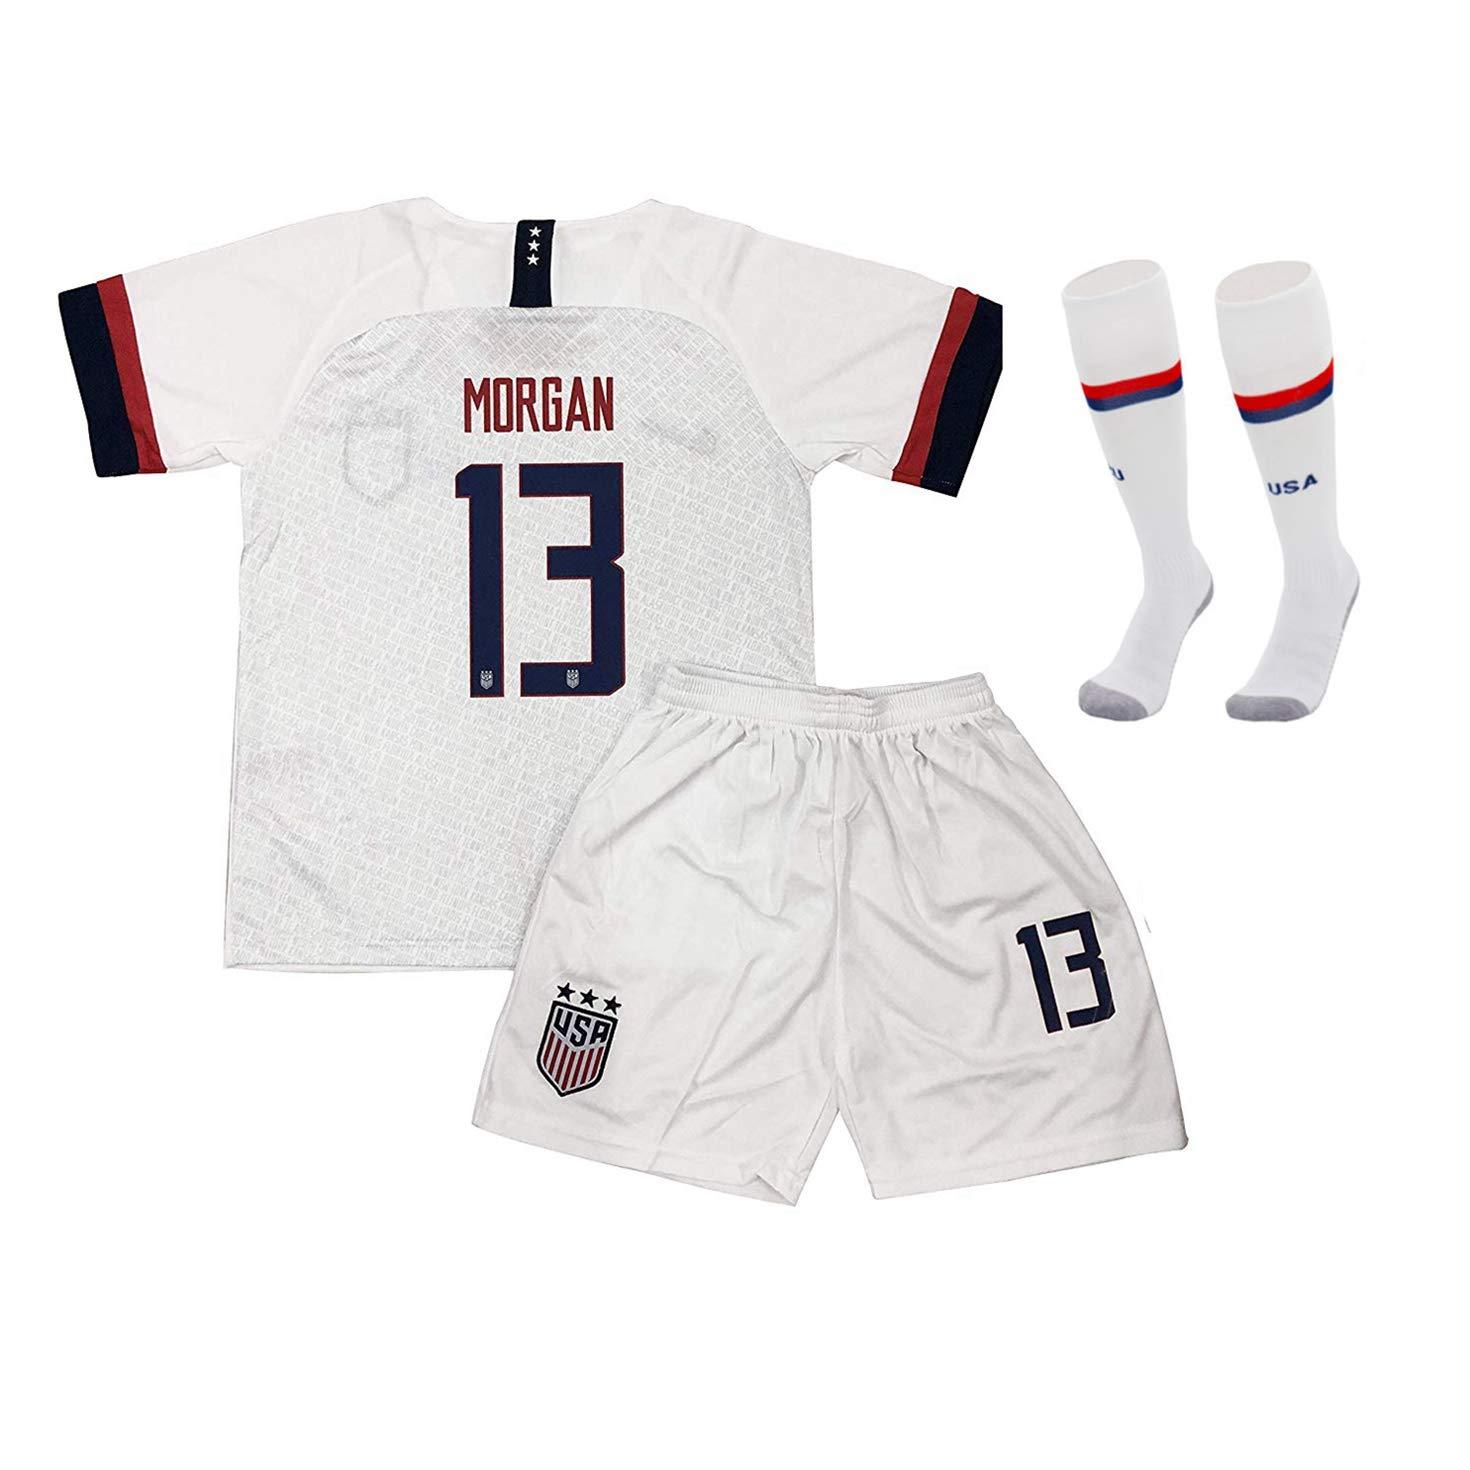 Shenyizhu Alex Morgan 13 USA Youth/Kid 20season Home/Away T-Shirt Socks (White, 24) by Shenyizhu